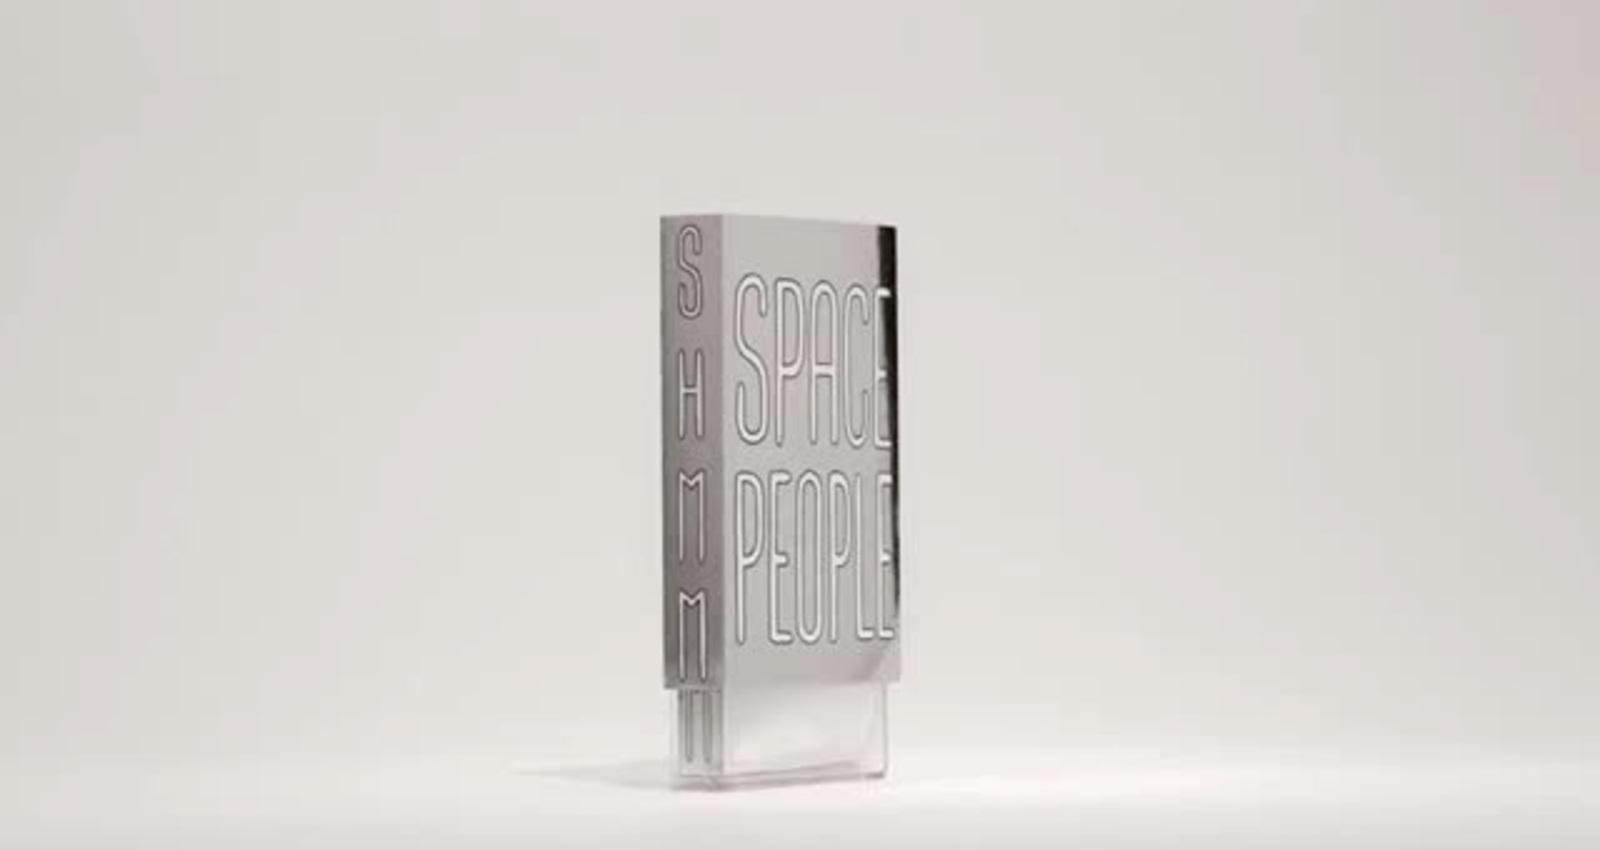 Space People Cassette Design & Animation